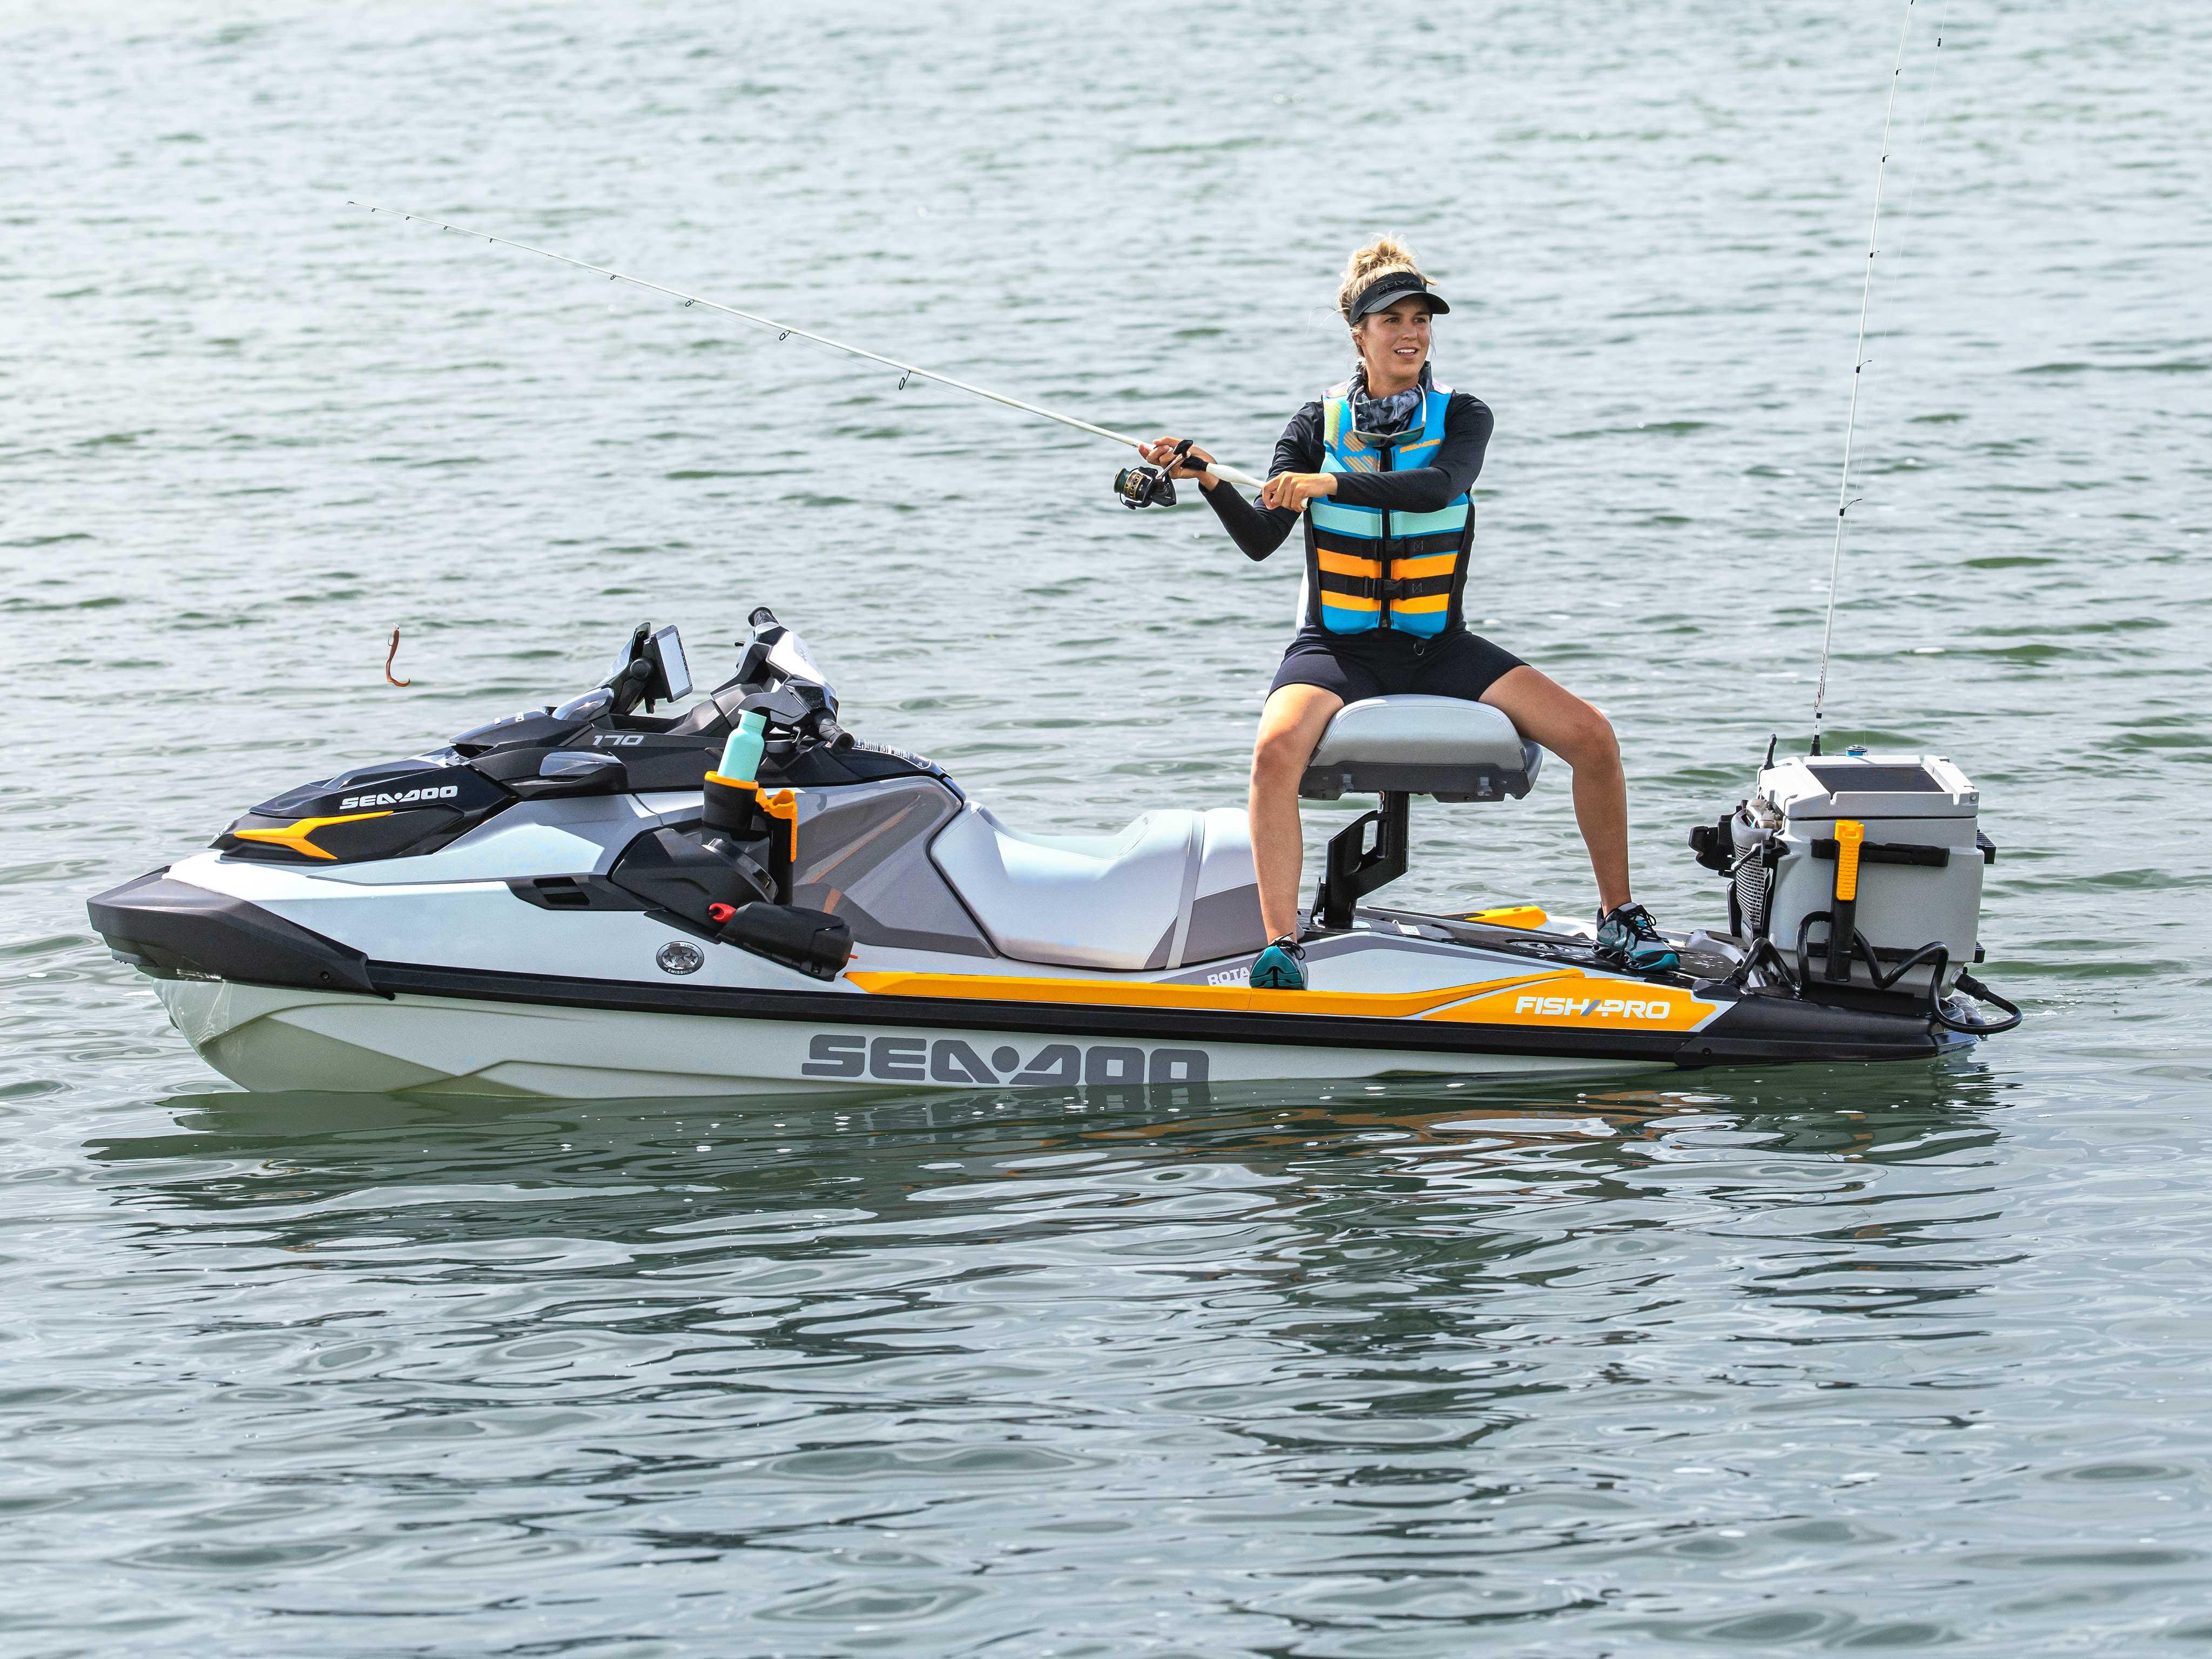 Woman fishing on her Sea-Doo FishPro Trophy with the new modular swivel seat